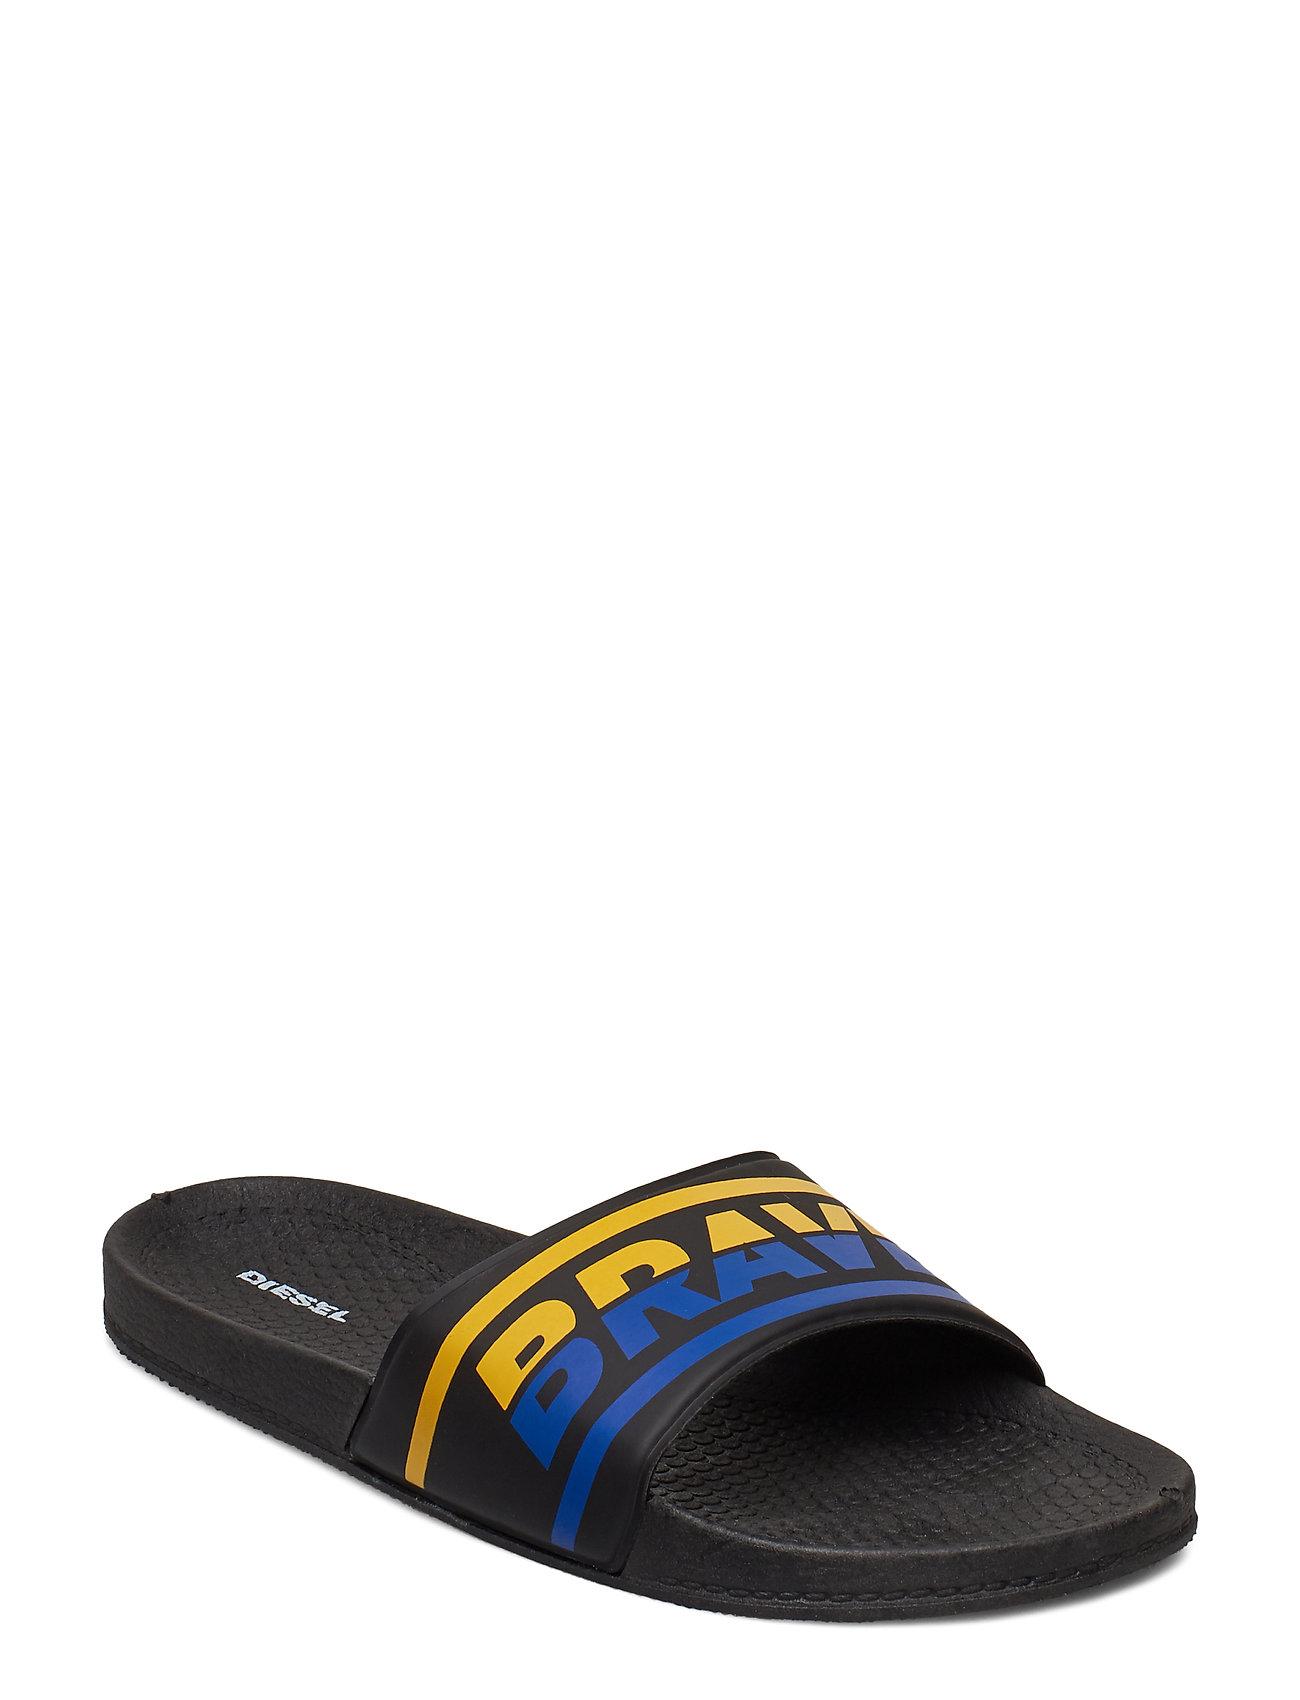 Image of A-Lohaa Ff 01 Slipper Yo - Slide (3110999007)